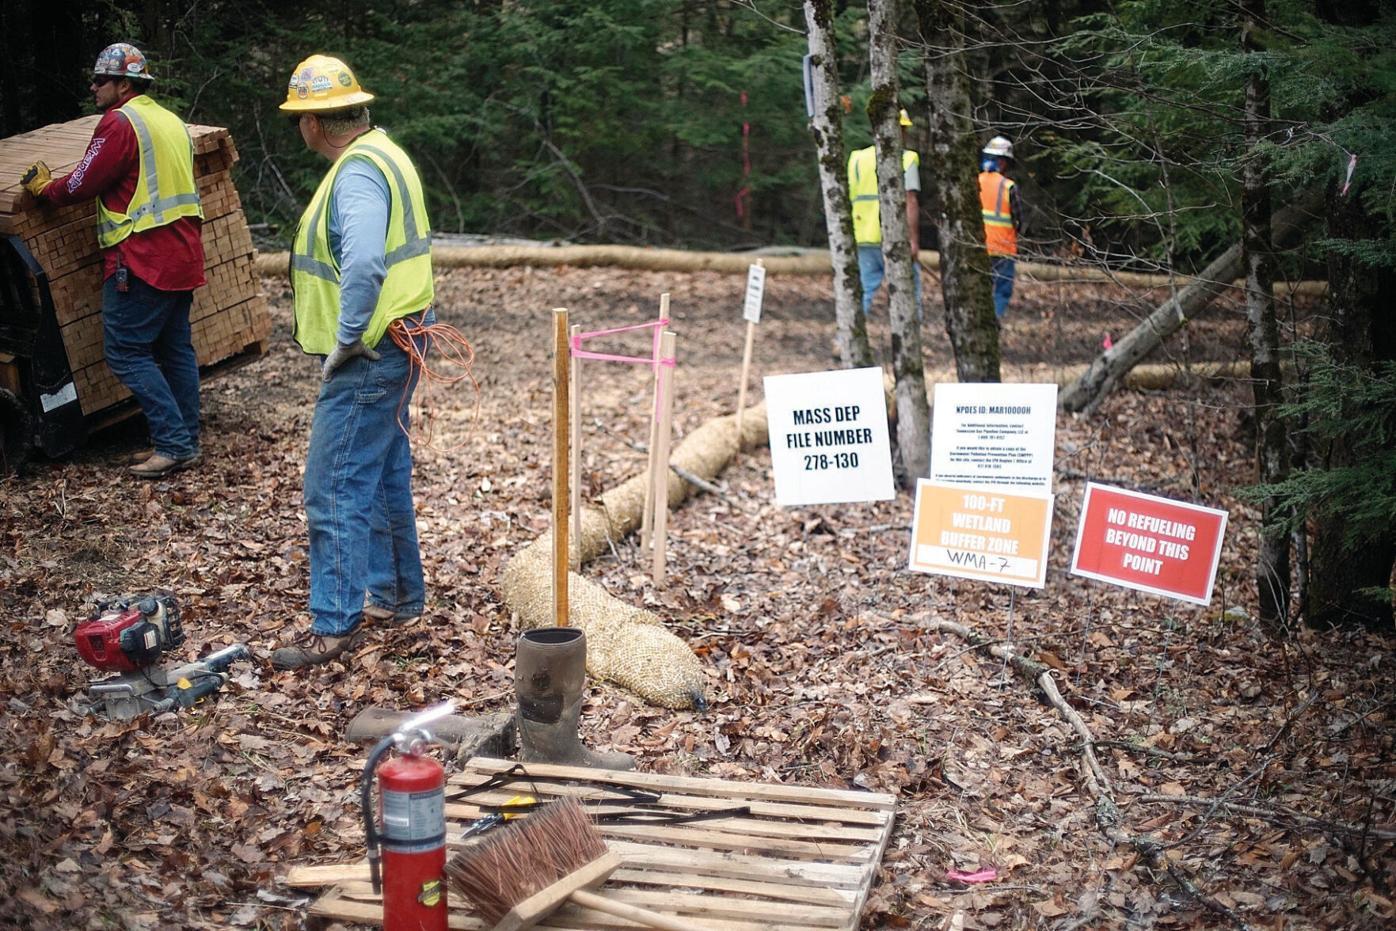 Massachusetts PipeLine Awareness Network seeks rehearing by FERC, asks for stay of construction in Otis State Forest